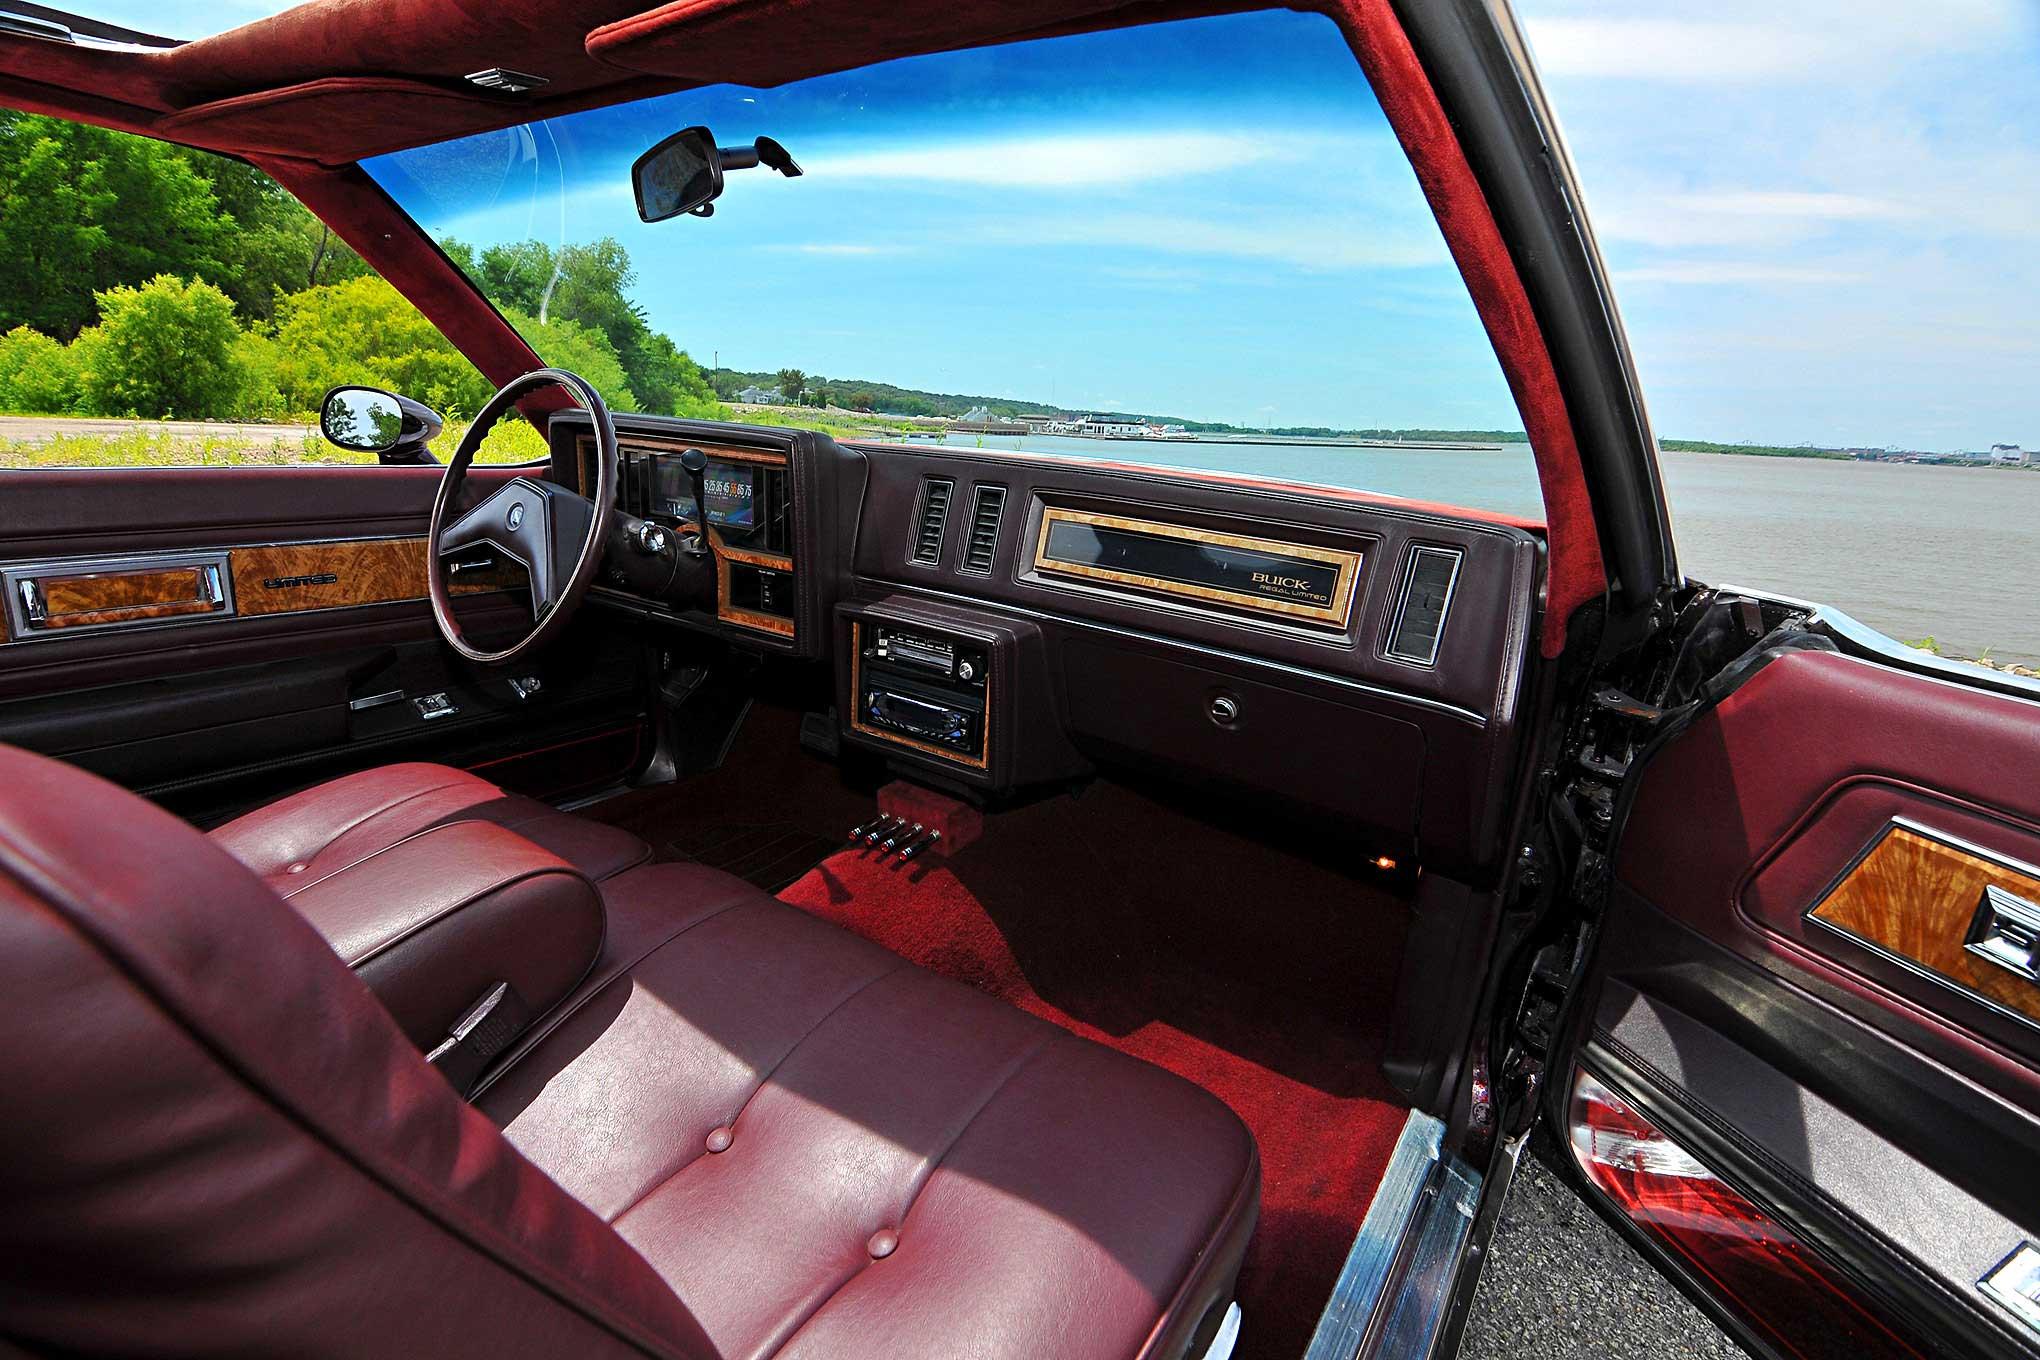 1985 Buick Regal Dash